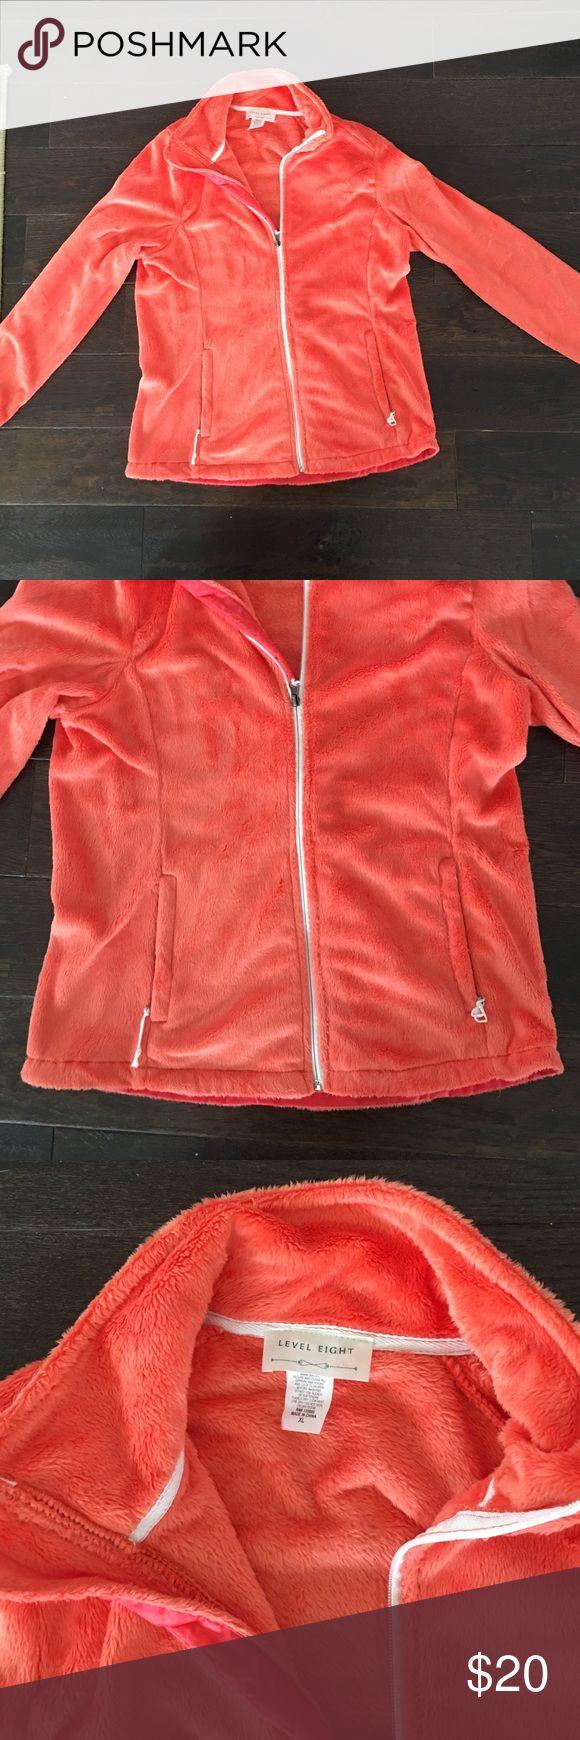 NWOT women's XL fuzzy soft zip up jacket! NWOT women's XL fuzzy soft zip up jacket! Very soft fuzzy fur- brand new- never worn. Orange color. Very warm! Jackets & Coats